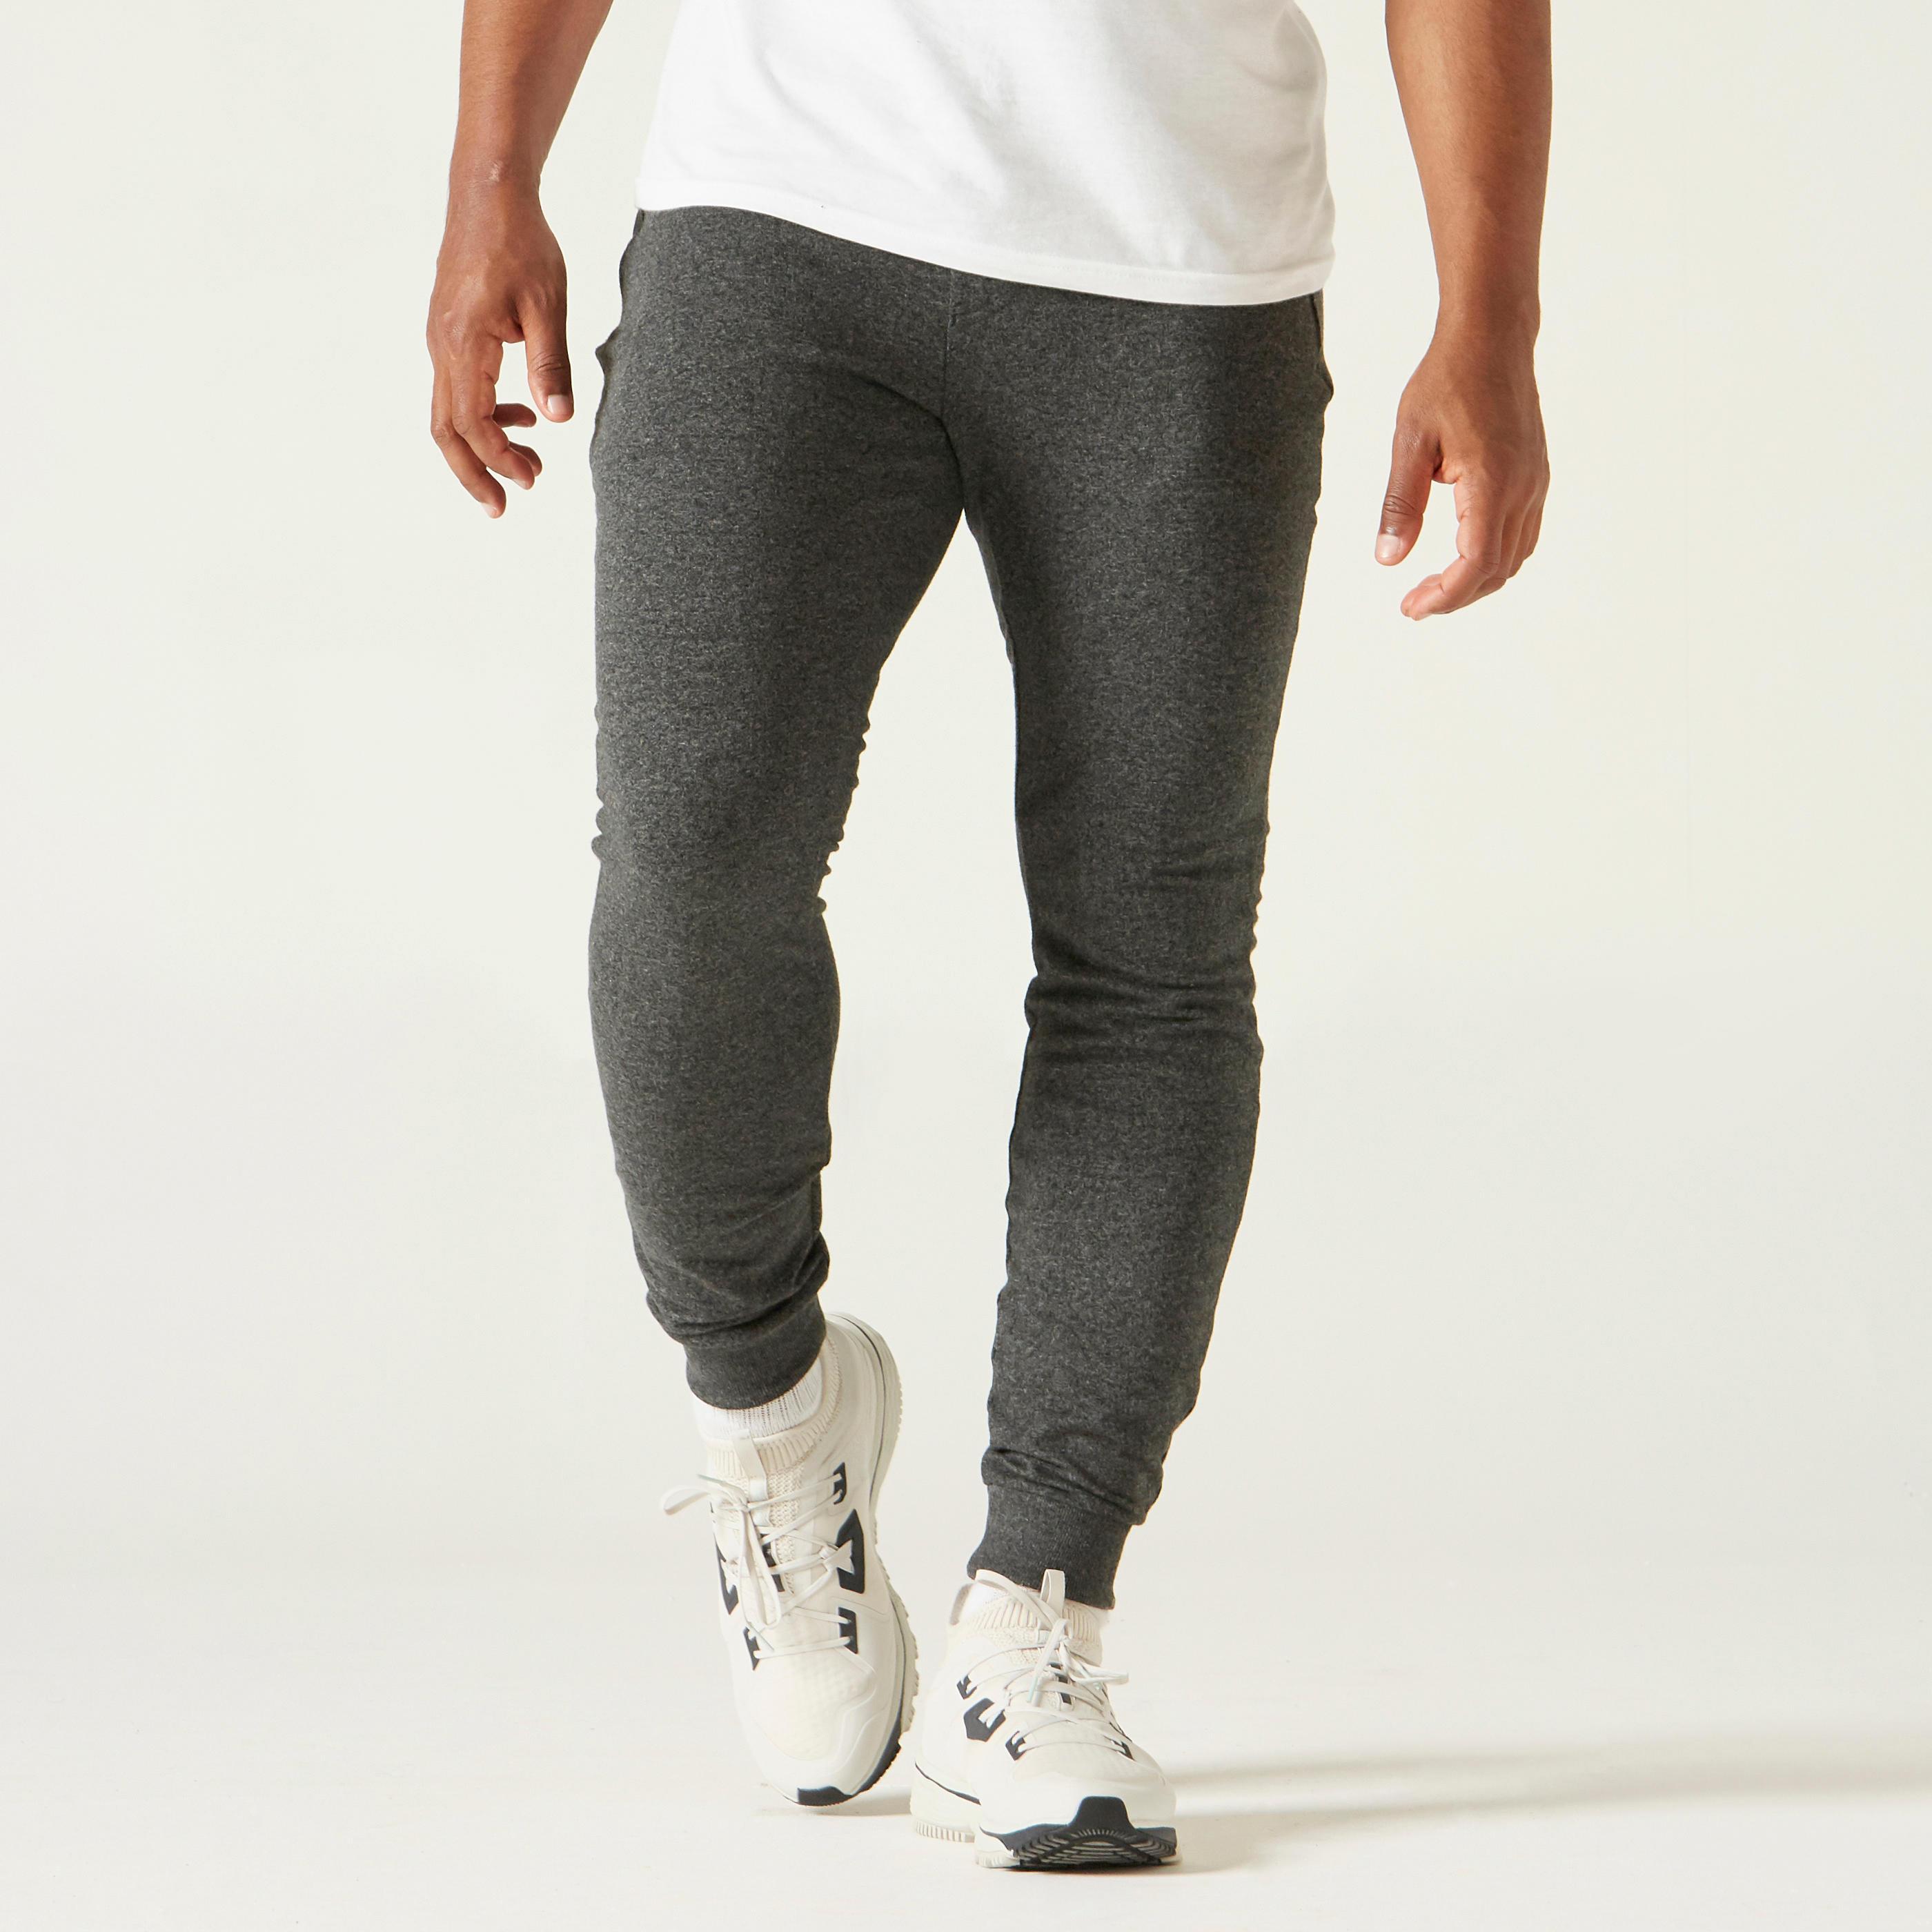 Pantalon slim 500 Gri Bărbați imagine